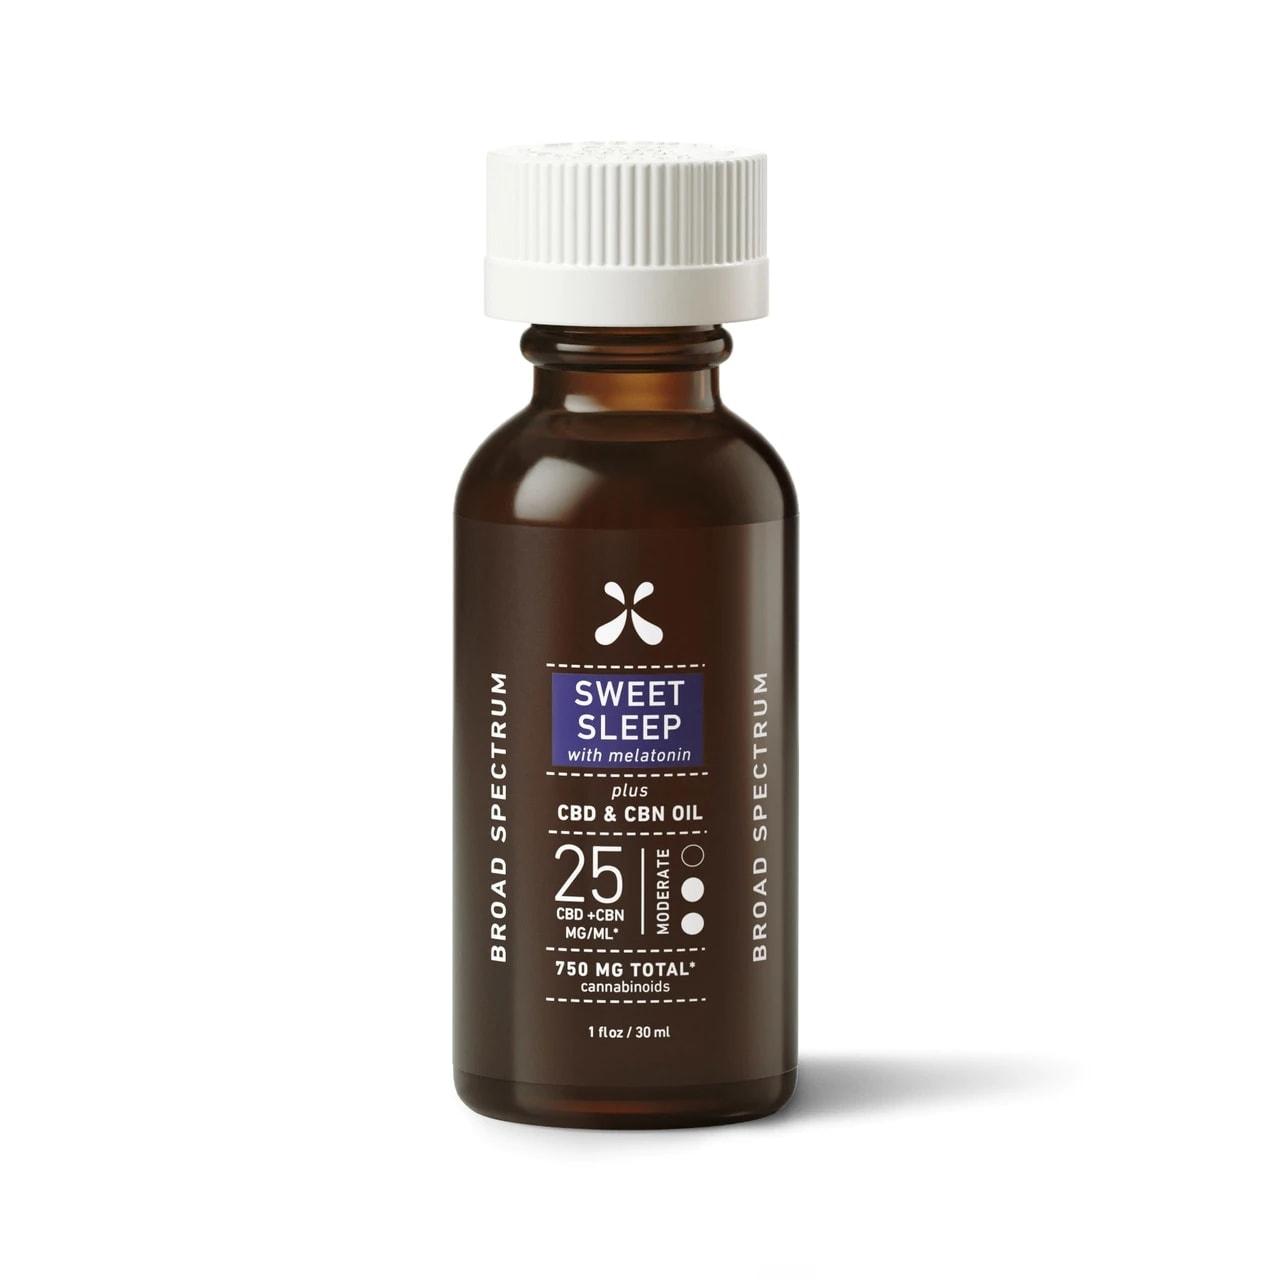 Green Roads, Sweet Sleep CBD+CBN Oil, Broad Spectrum THC-Free, 1oz, 25MG:ML, 750mg of CBD